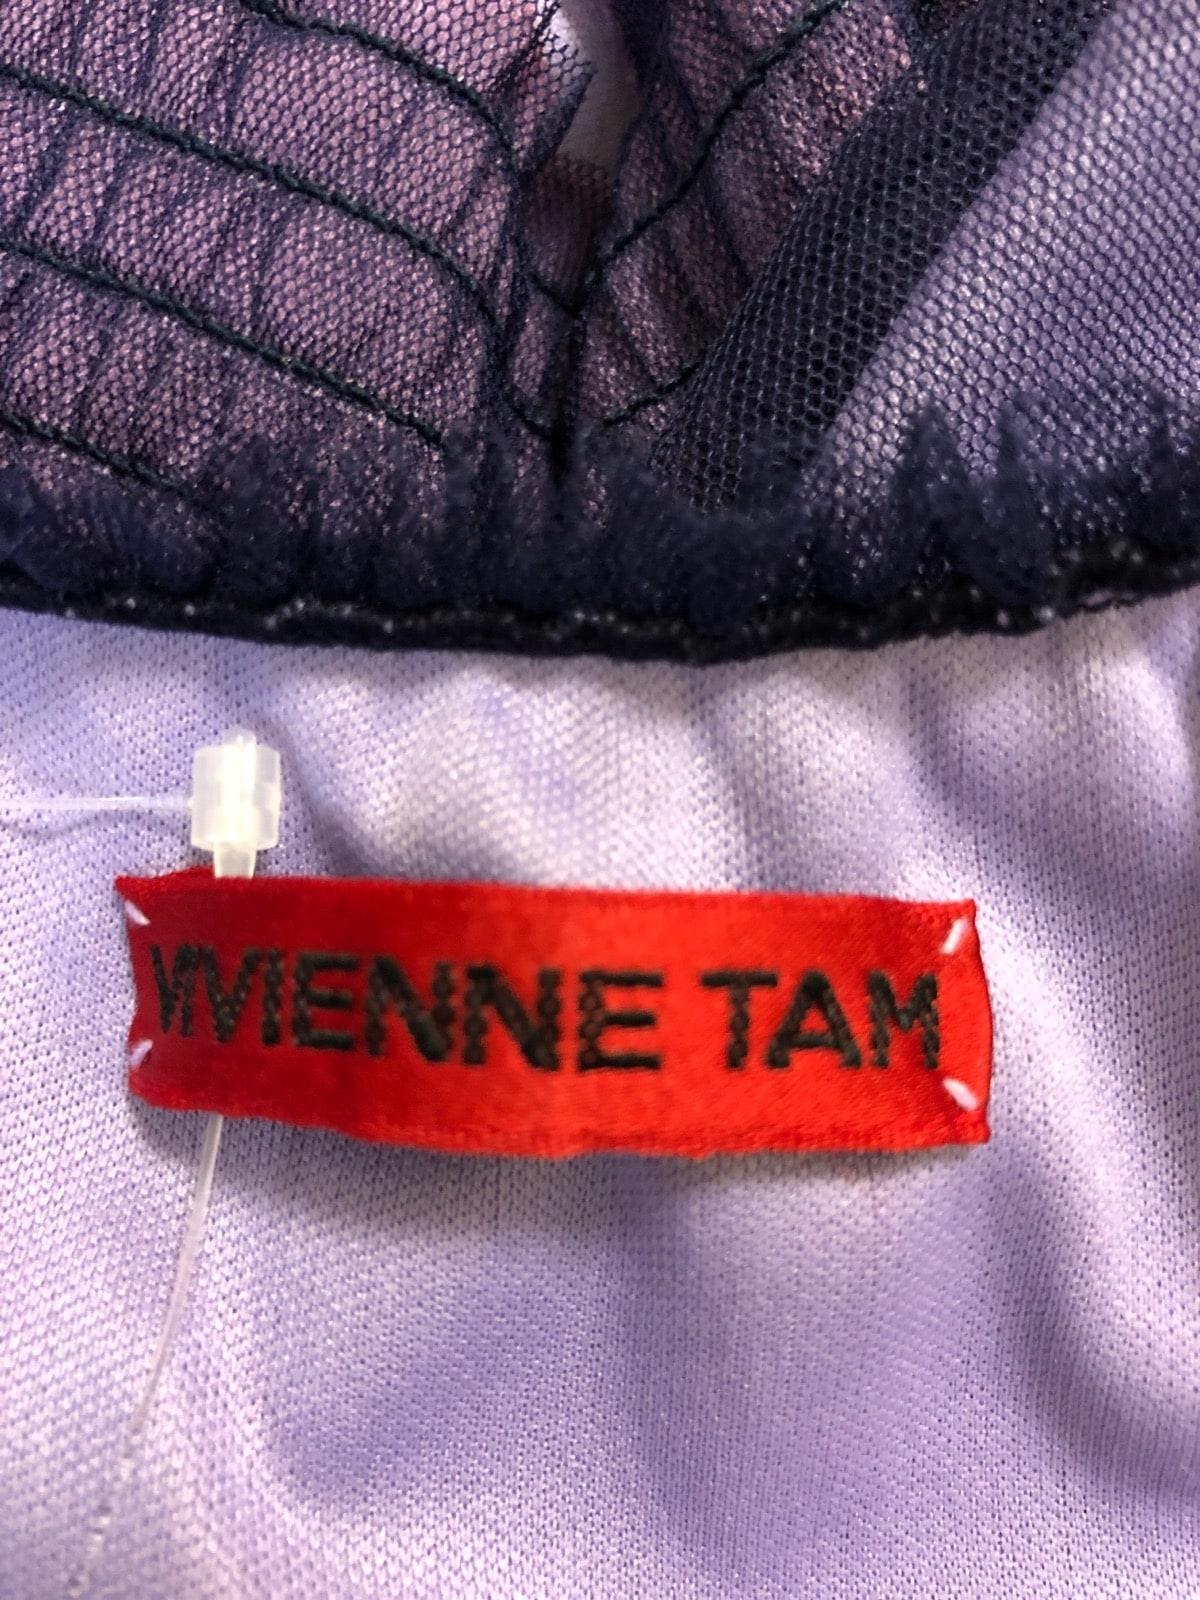 VIVIENNE TAM(ヴィヴィアンタム)のキャミソール